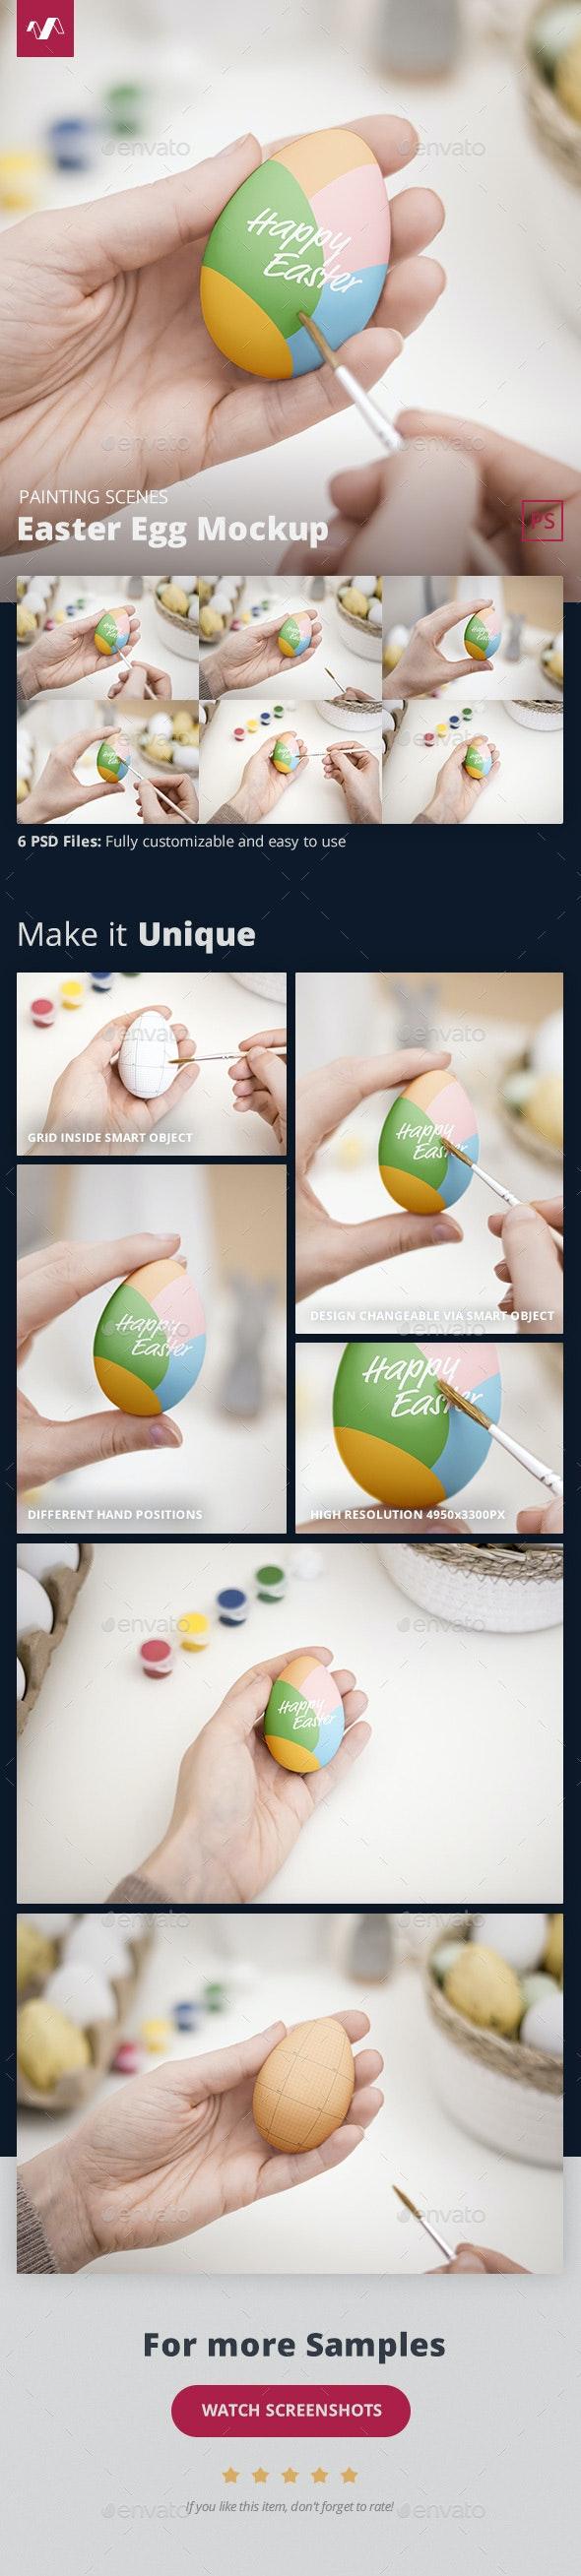 Easter Egg Mockup Painting Scene - Miscellaneous Product Mock-Ups